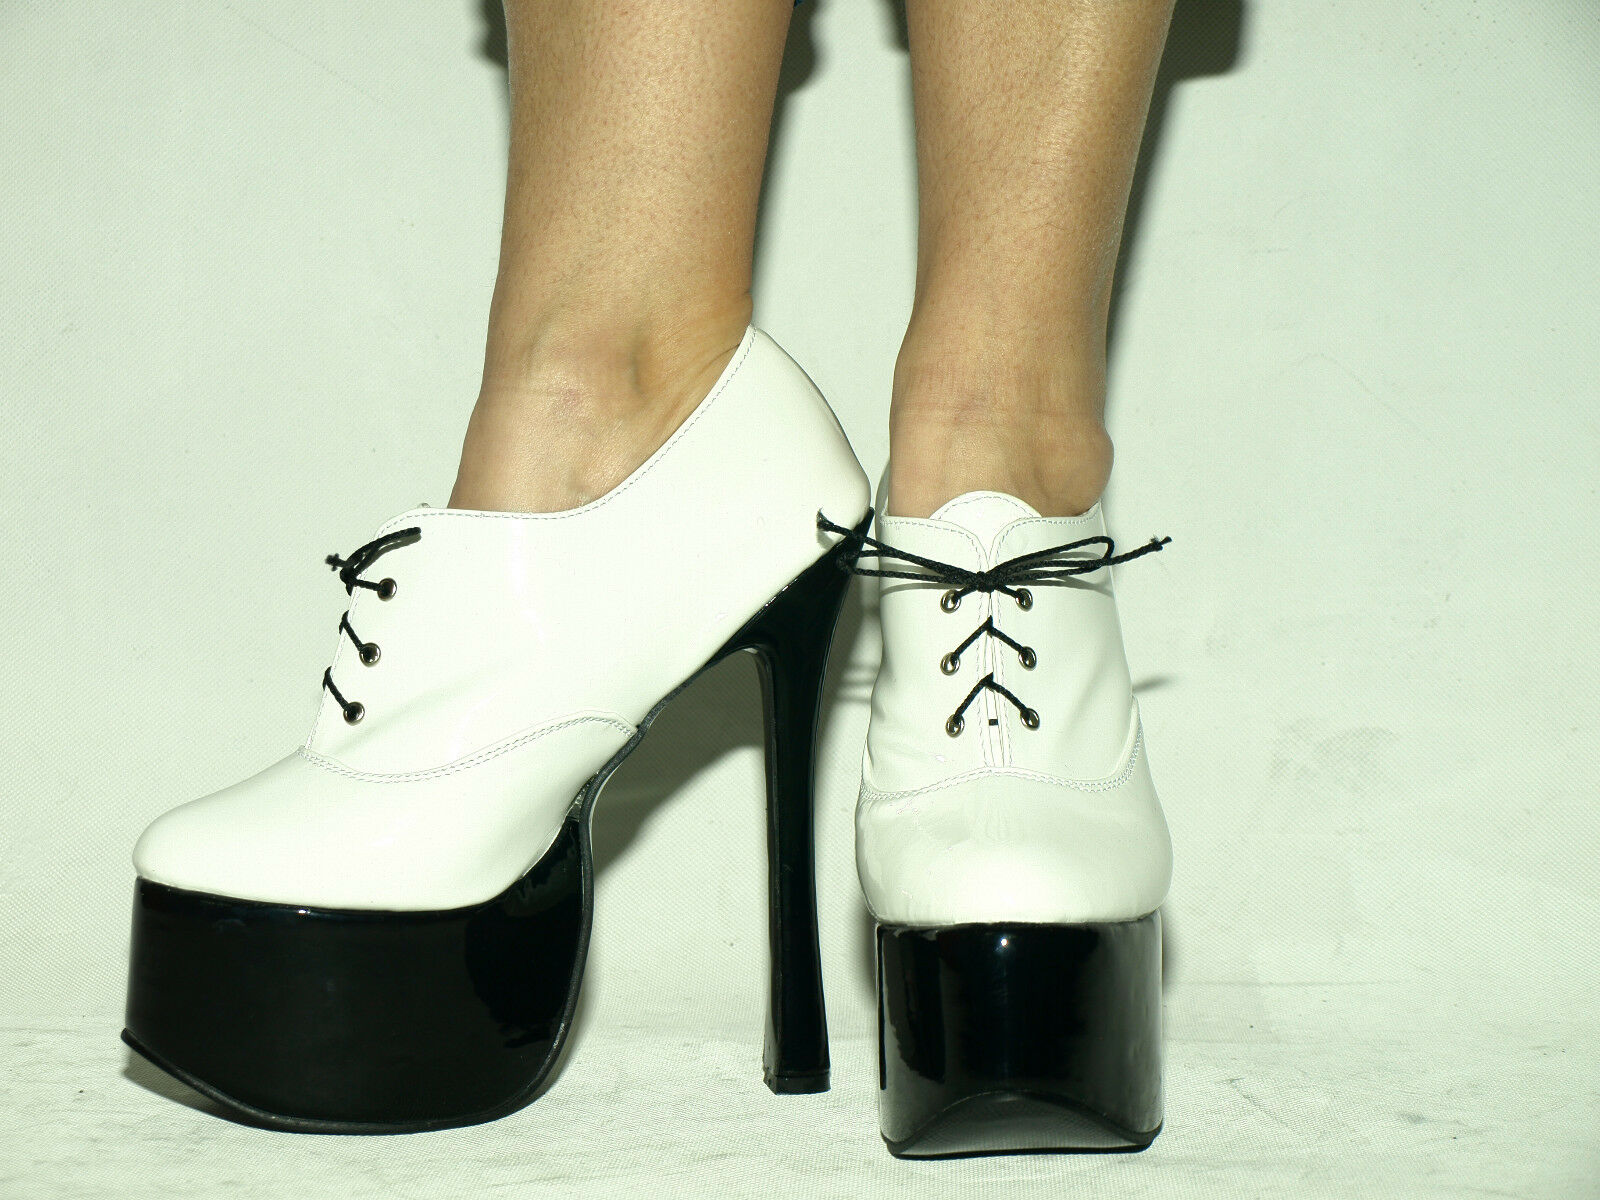 highs heels latex  37 38 39 40 45 41 42 43 44 45 40 46 47 Bolingier-Poland heels 20cm bc8e2b